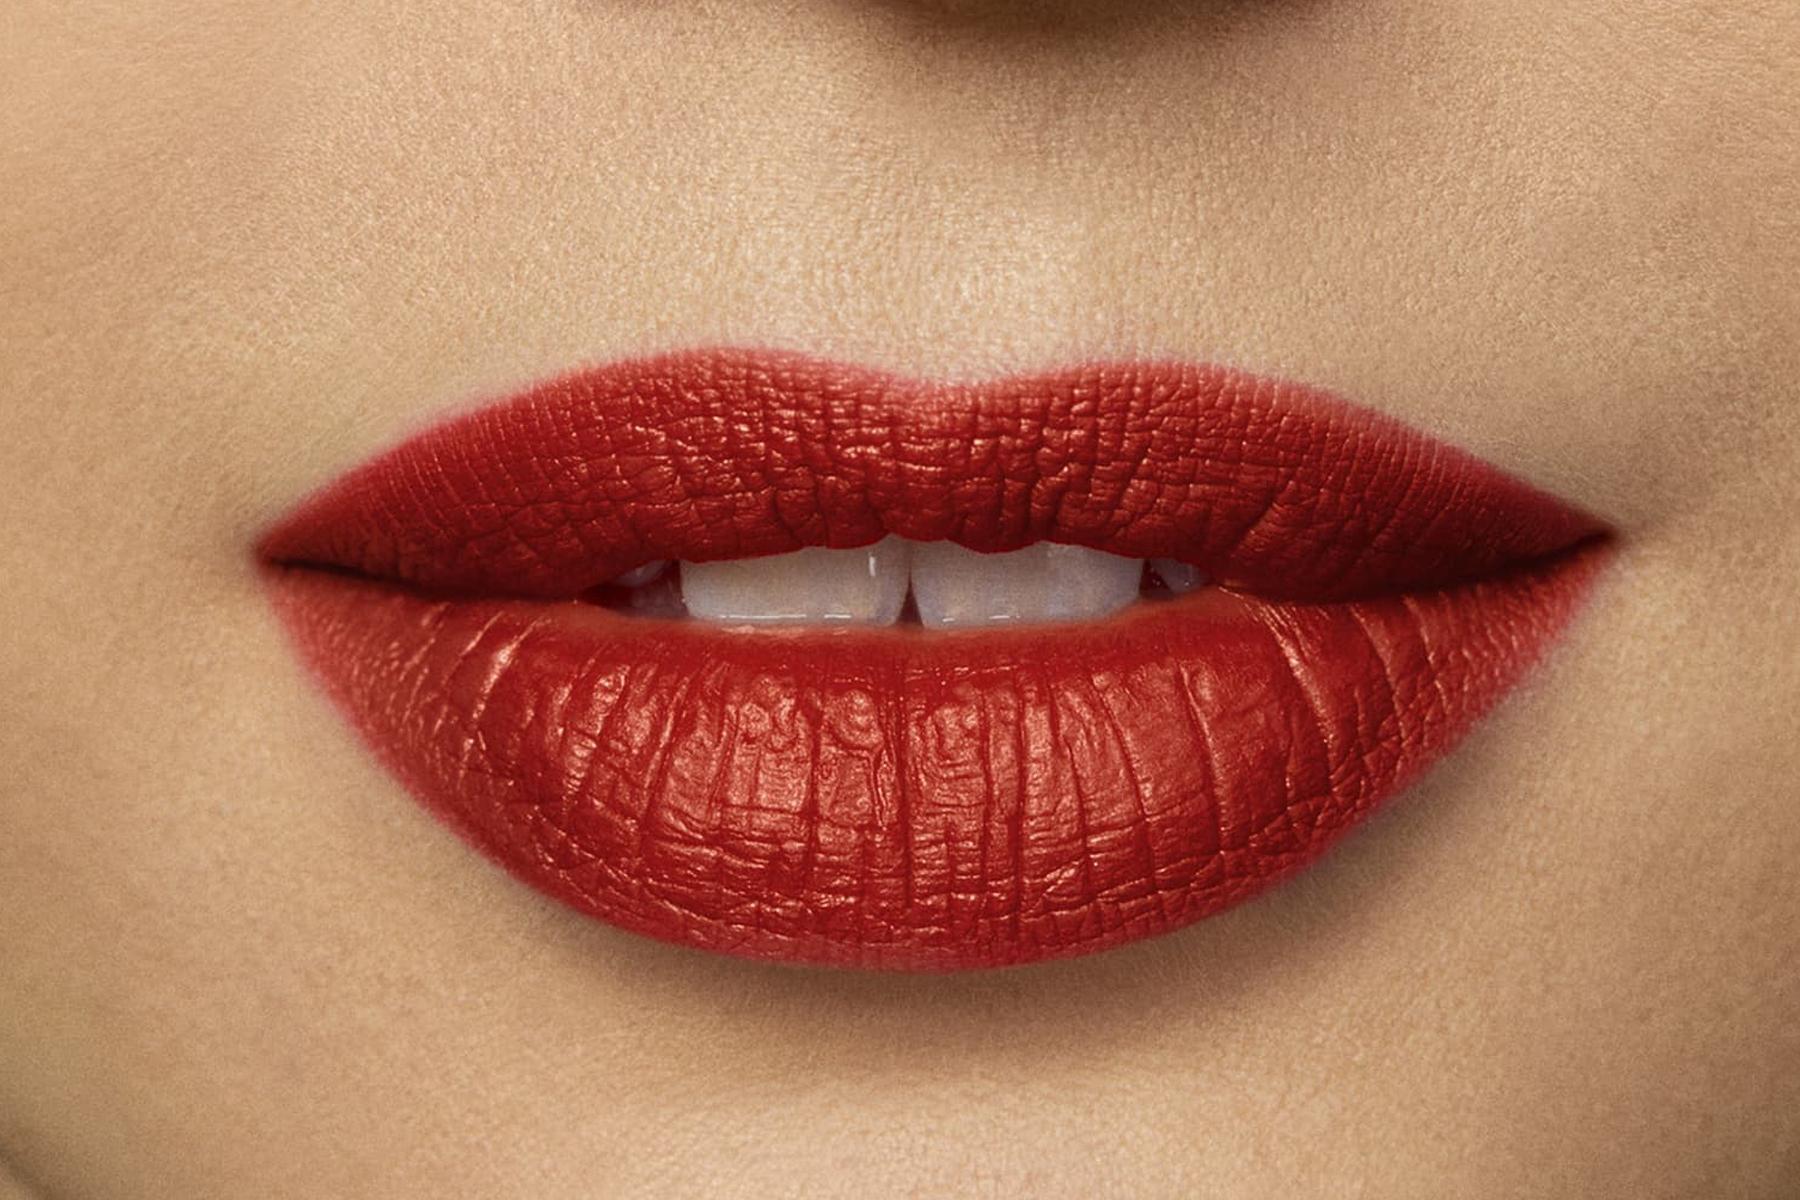 laura-mercier-rouge-essentiel-coral-vif-swatch